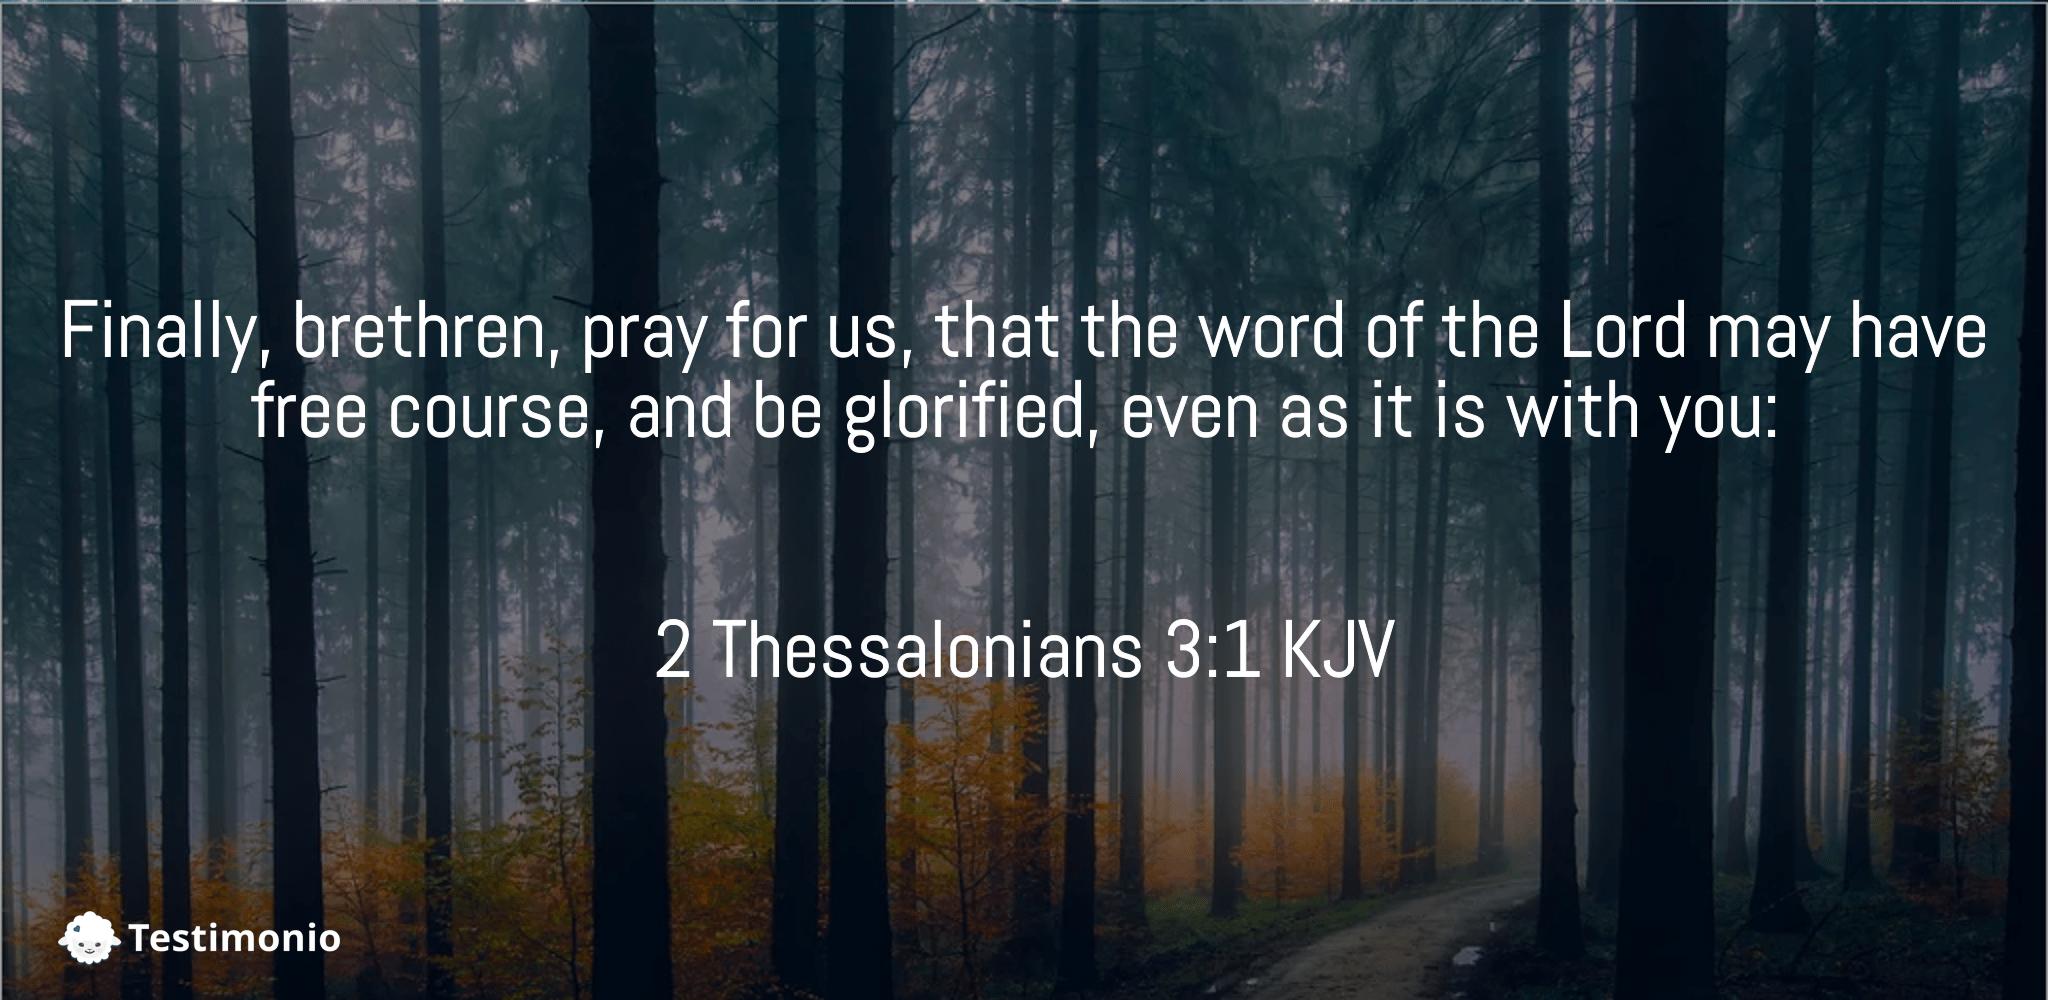 2 Thessalonians 3:1